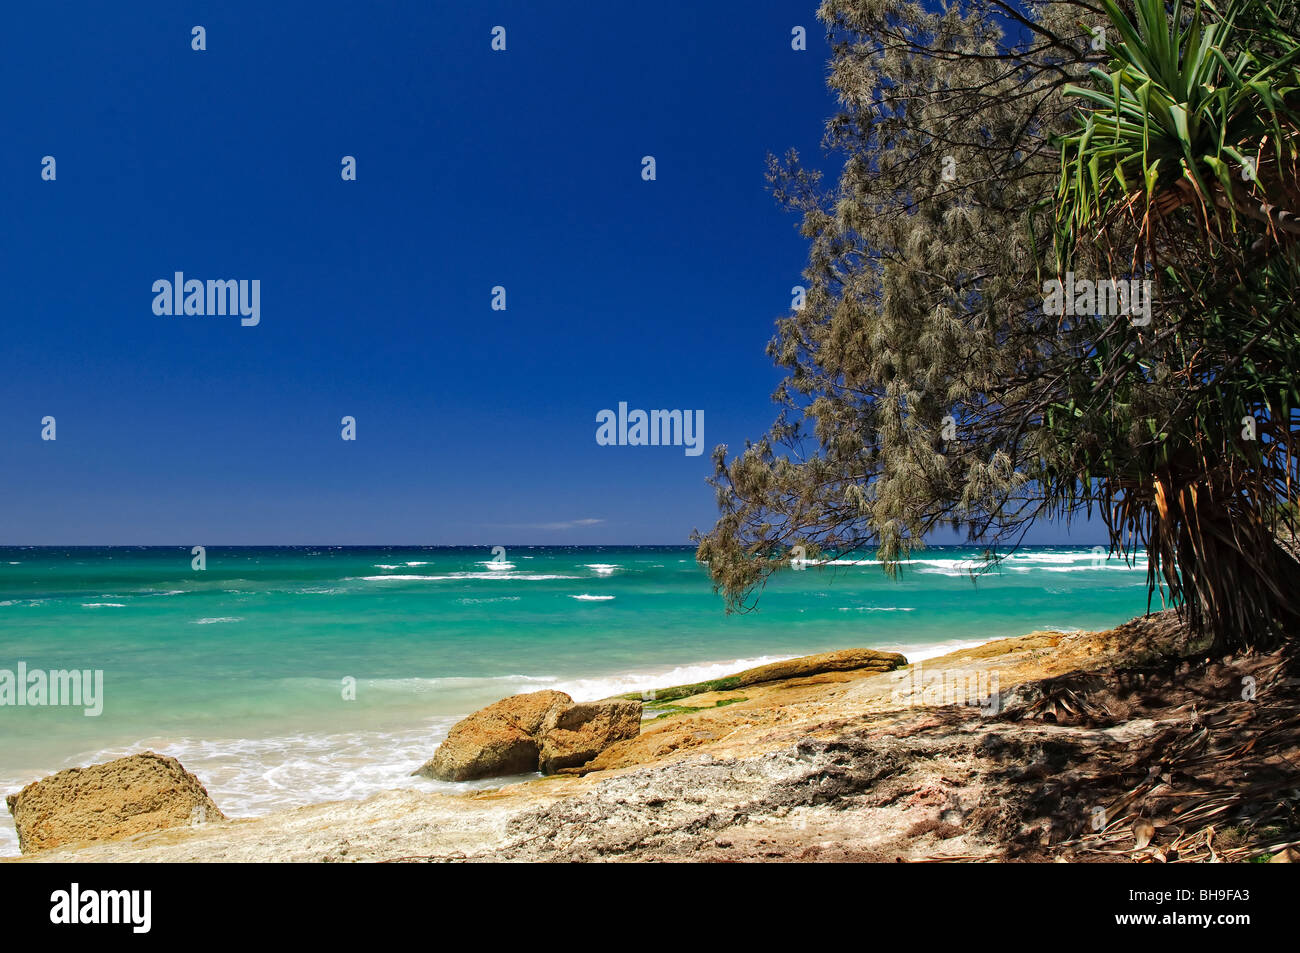 Cylinder Beach on North Stradbroke Island, Queensland, Australia North Stradbroke Island, just off Queensland's - Stock Image